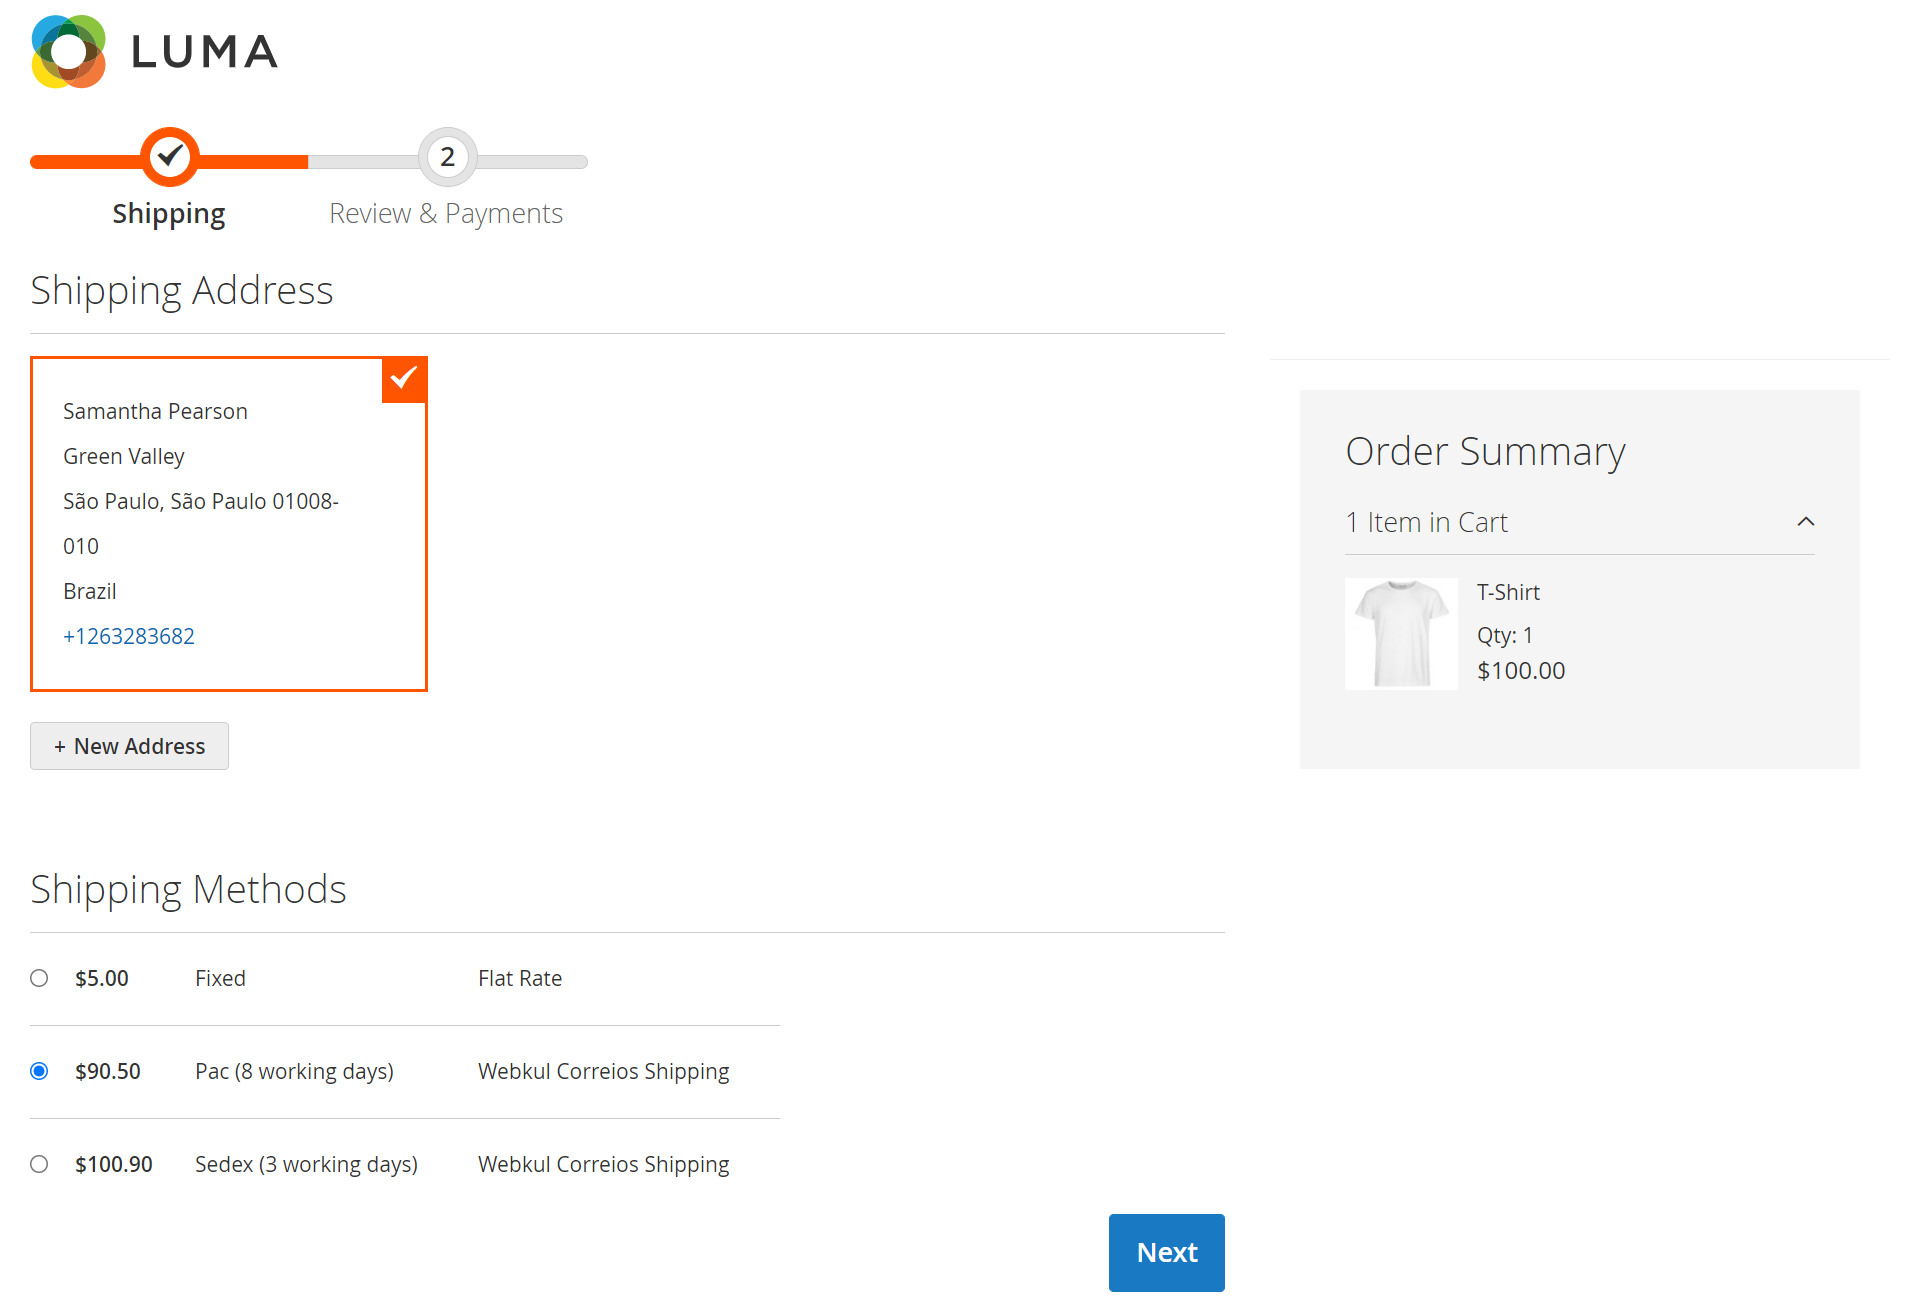 checkout -Webkul Correios Shipping